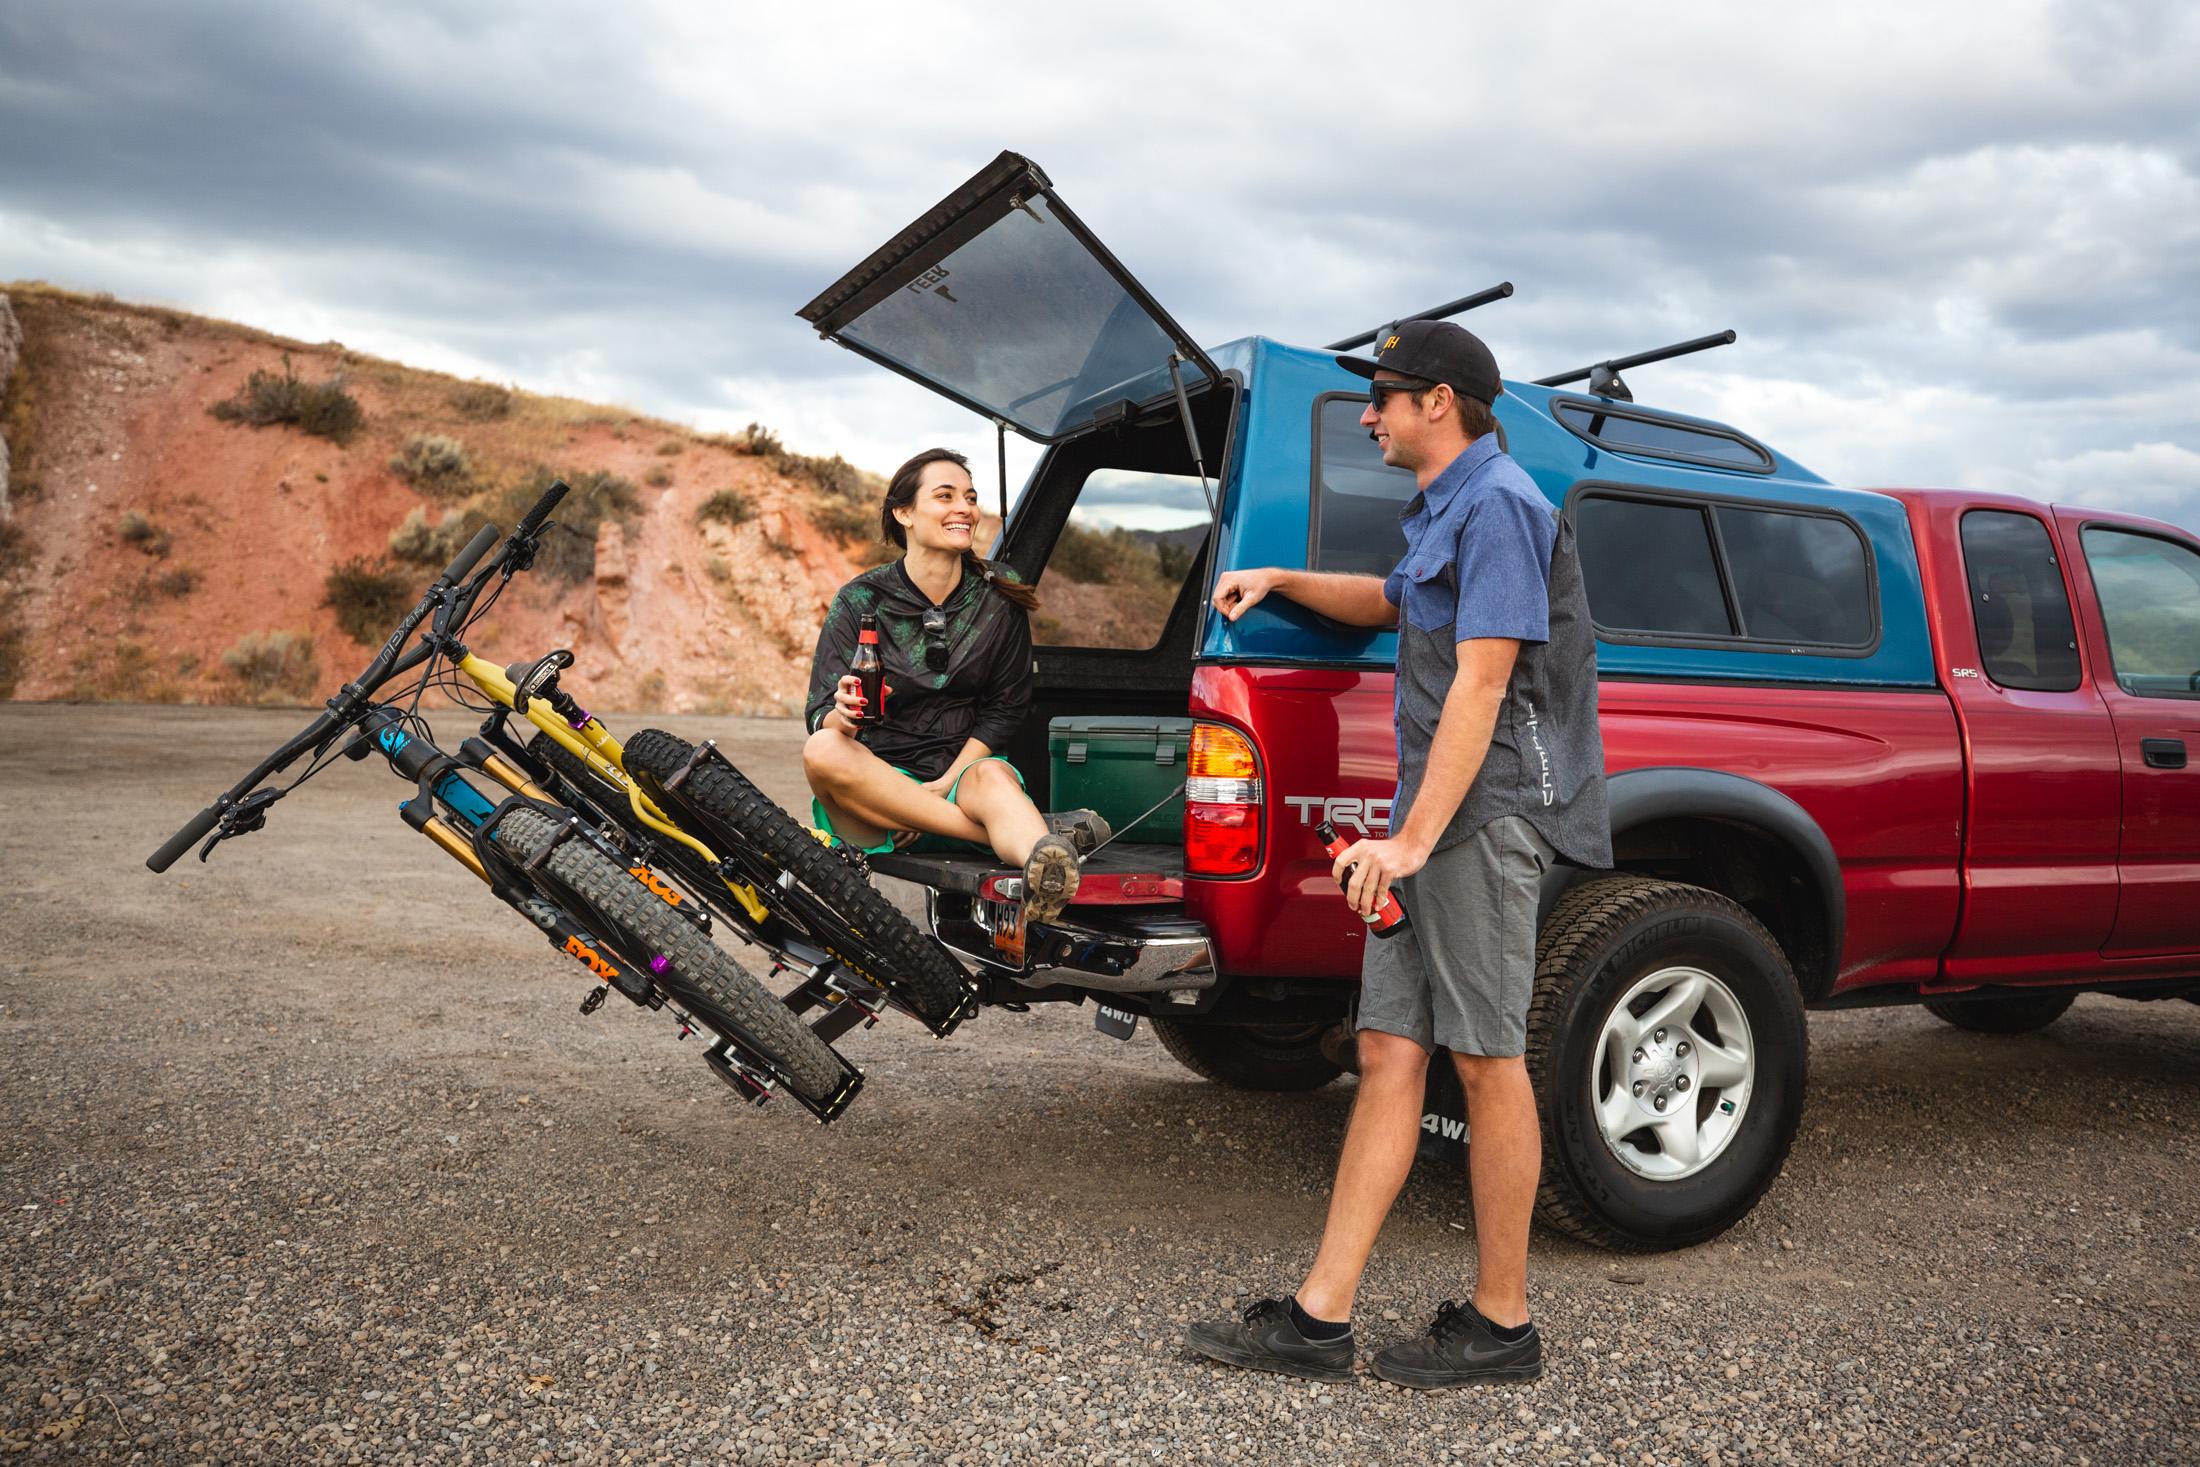 one-up-oneup-bike-racks-toyota-tacoma-sklar-2003-pivot.jpg